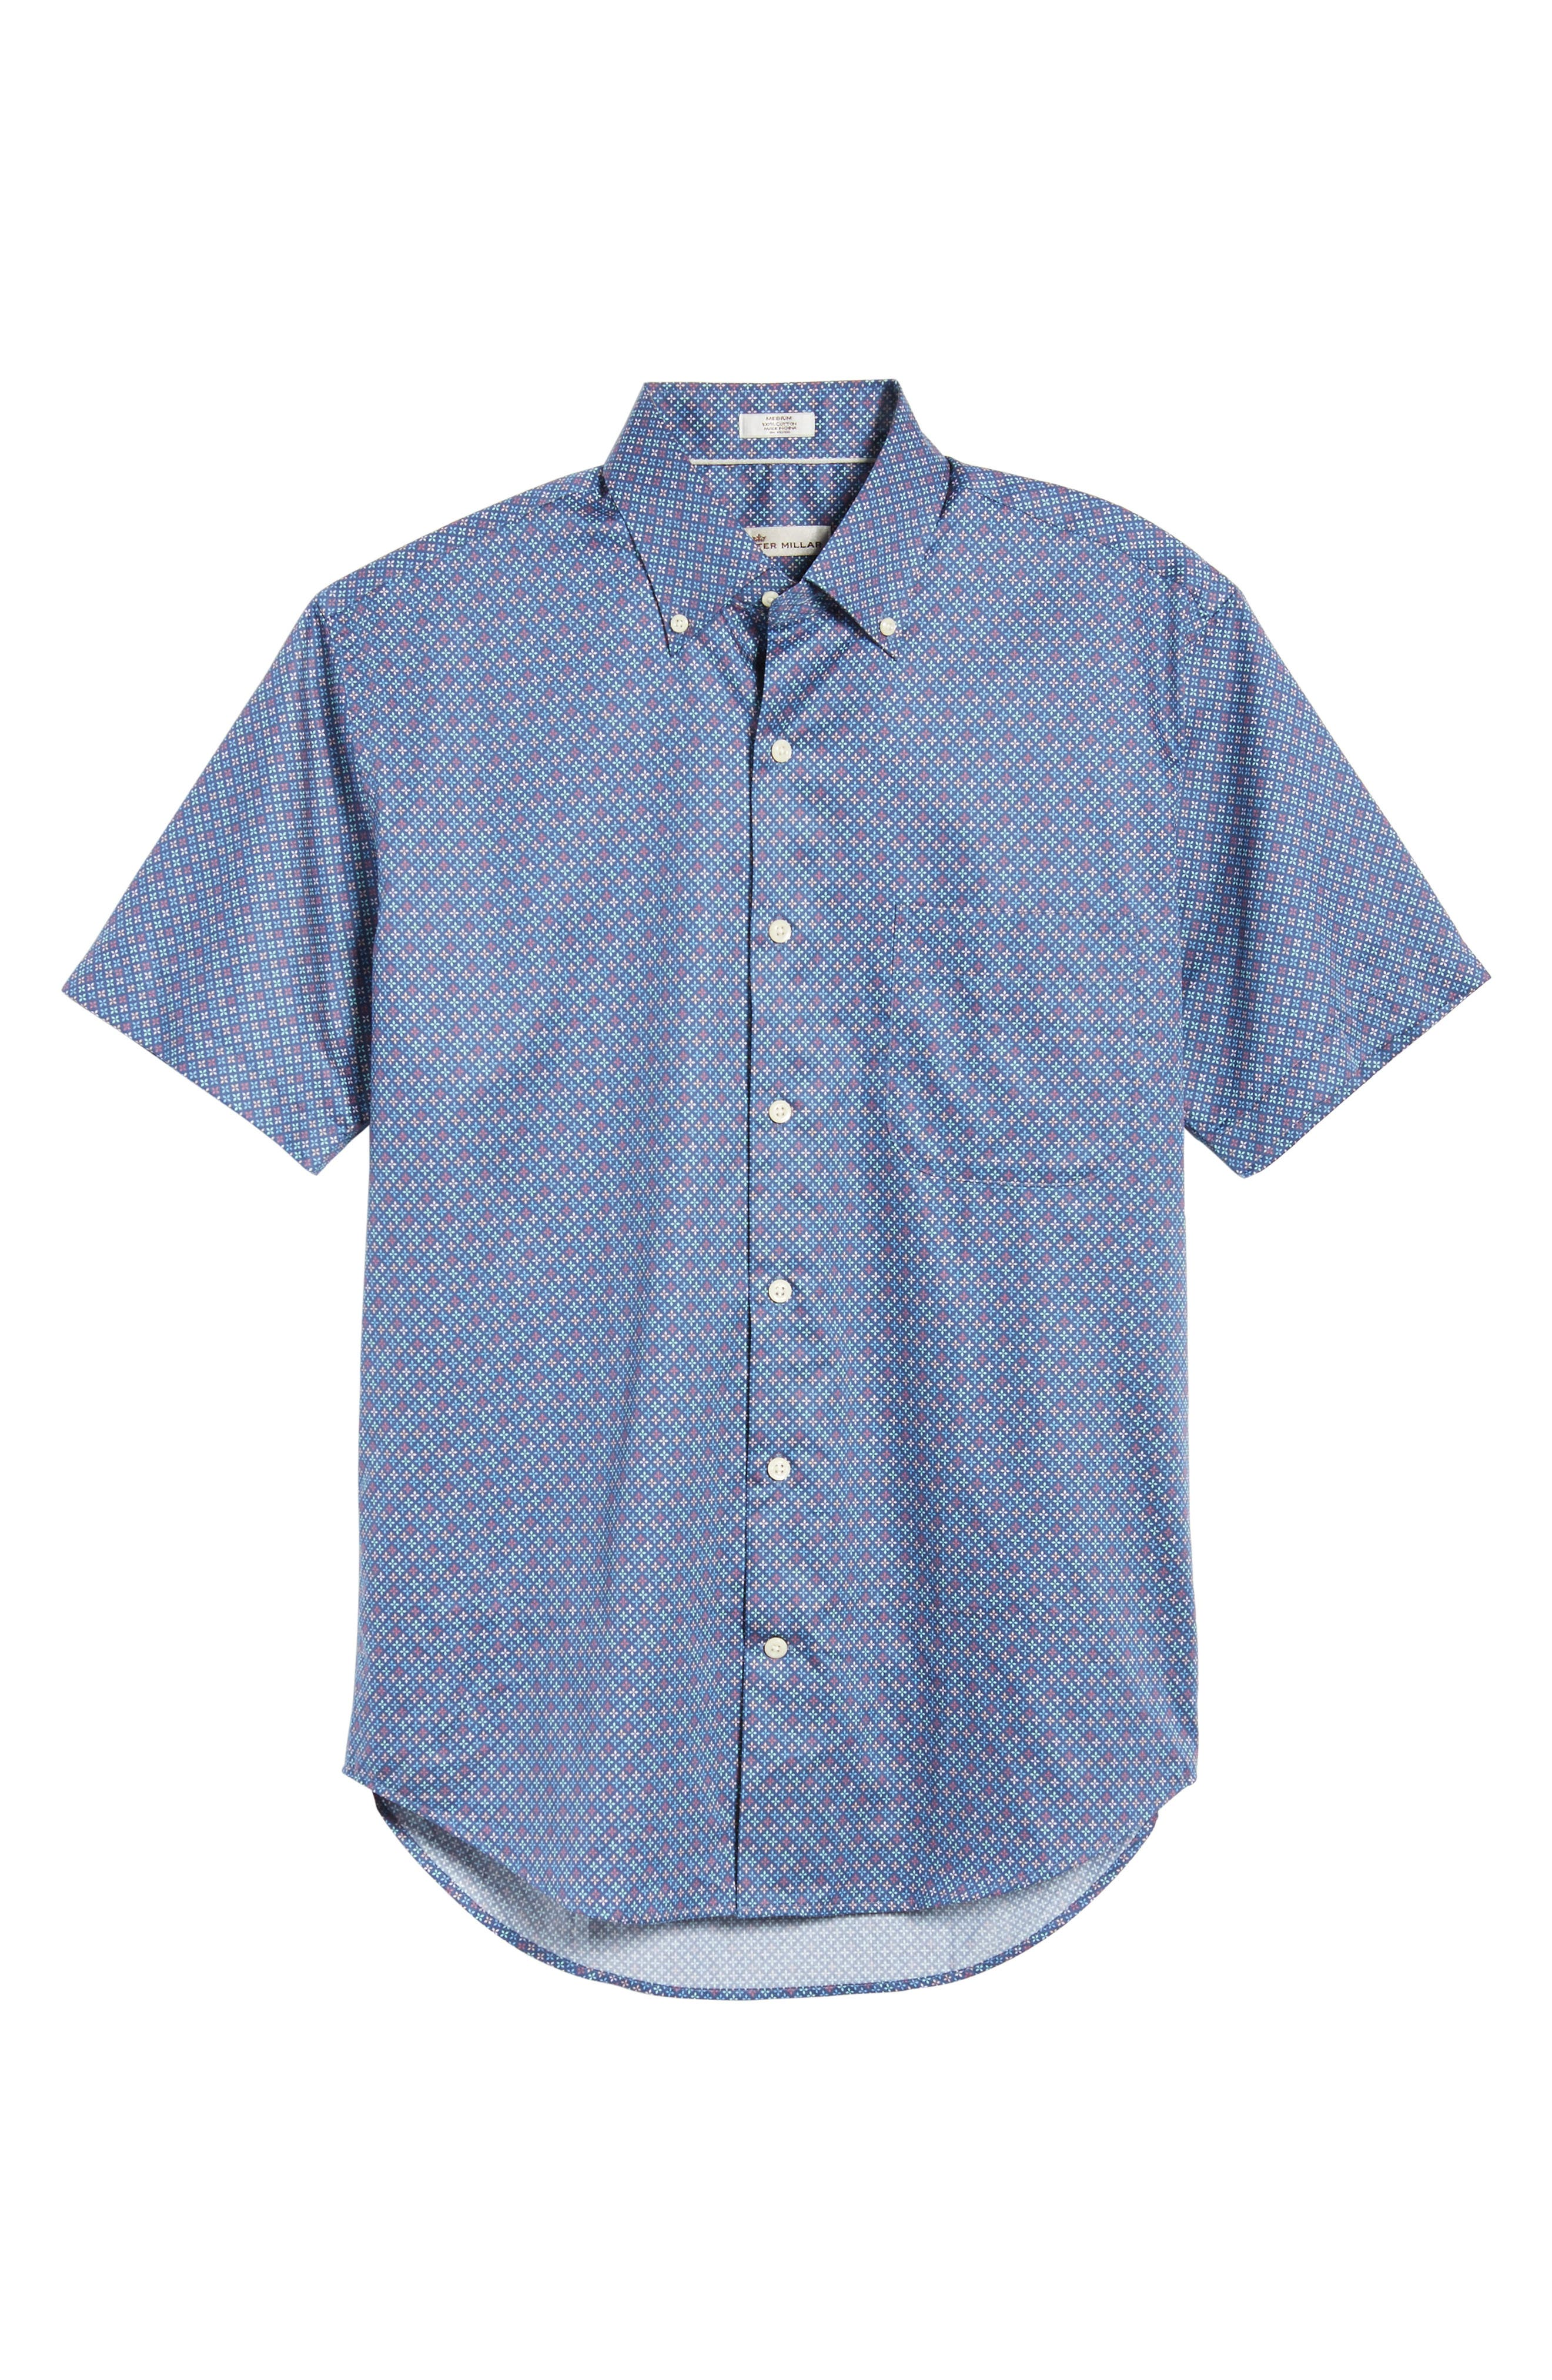 All Aces Regular Fit Sport Shirt,                             Alternate thumbnail 6, color,                             YANKEE BLUE